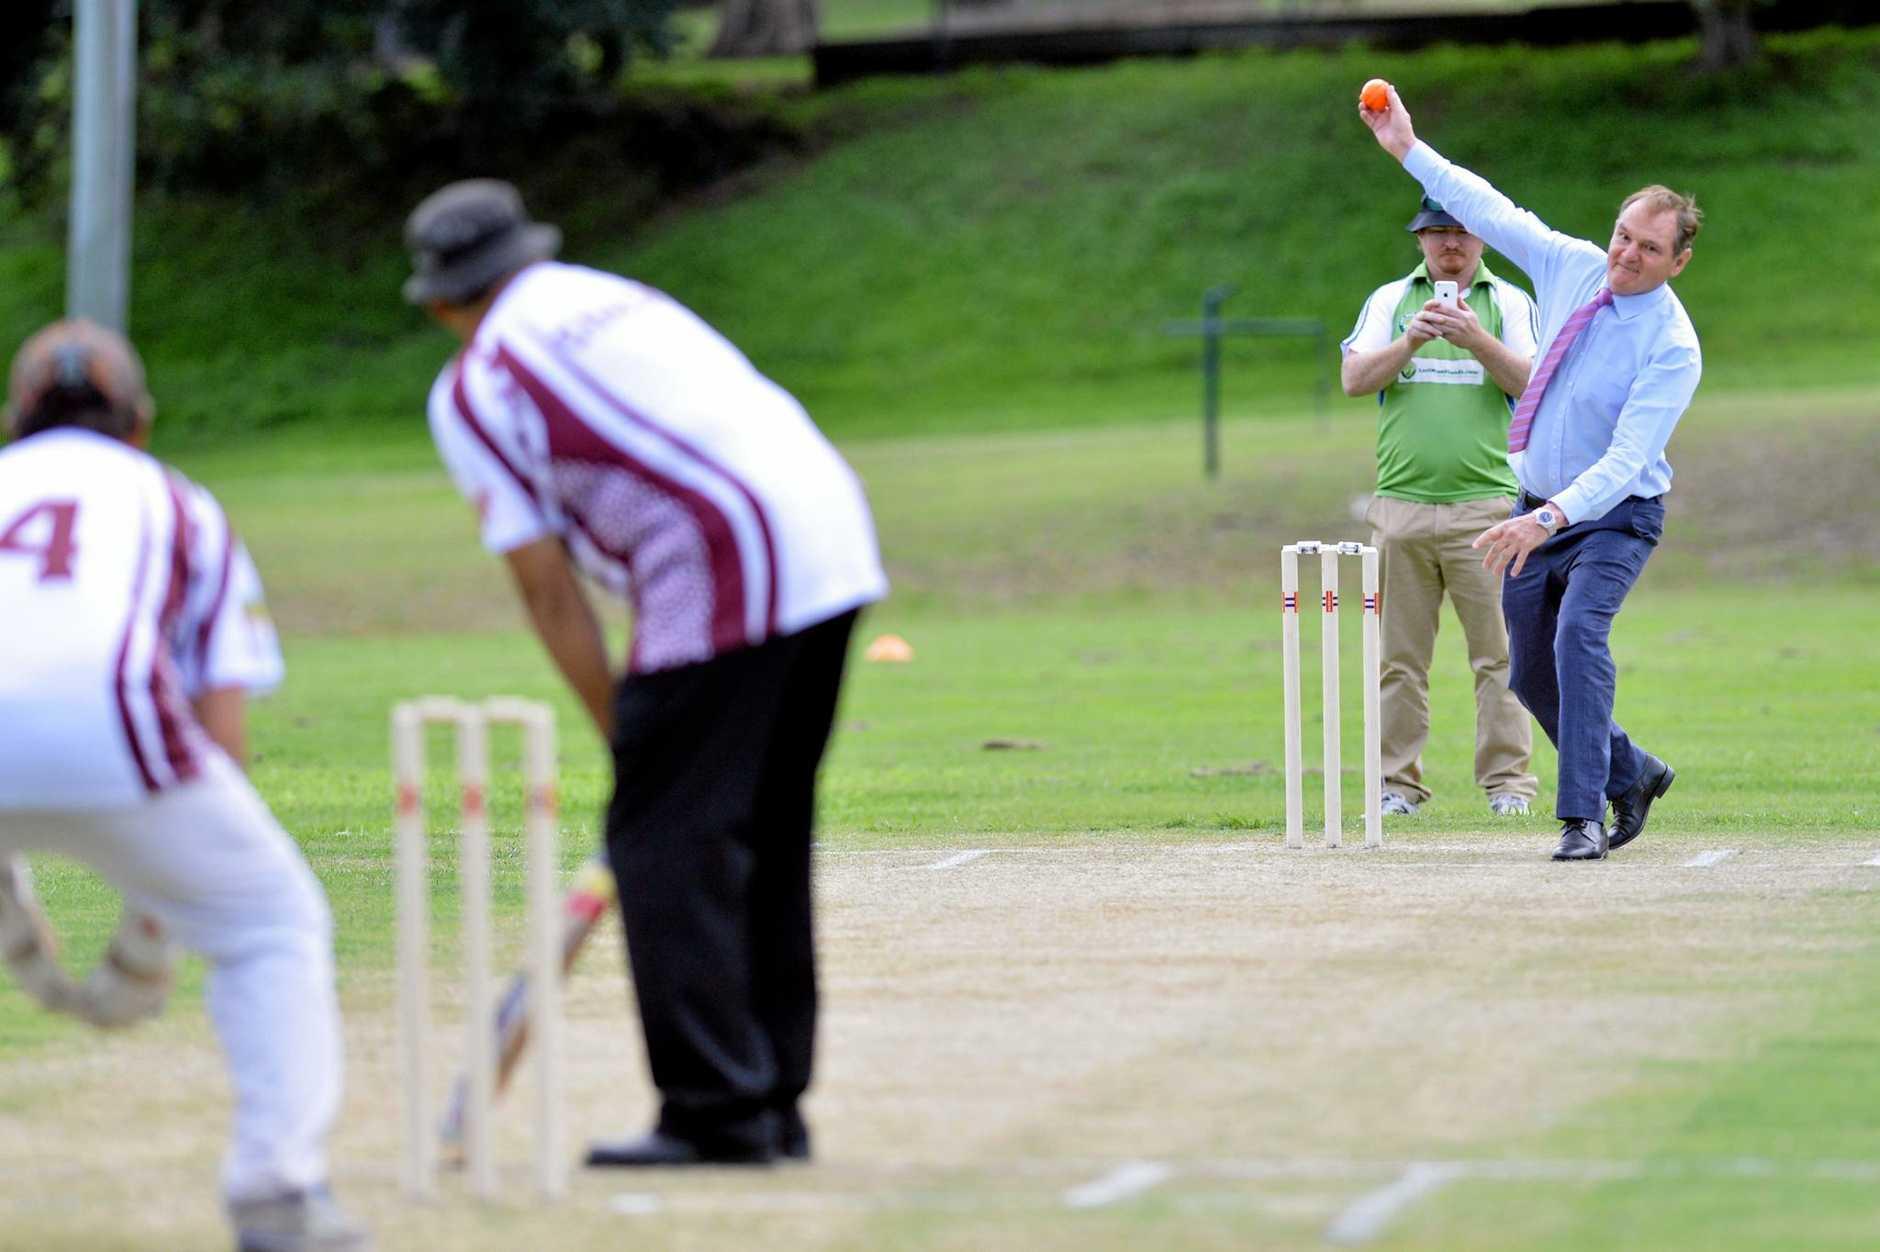 Action from the Inaugural NAIDOC Cricket Cup.